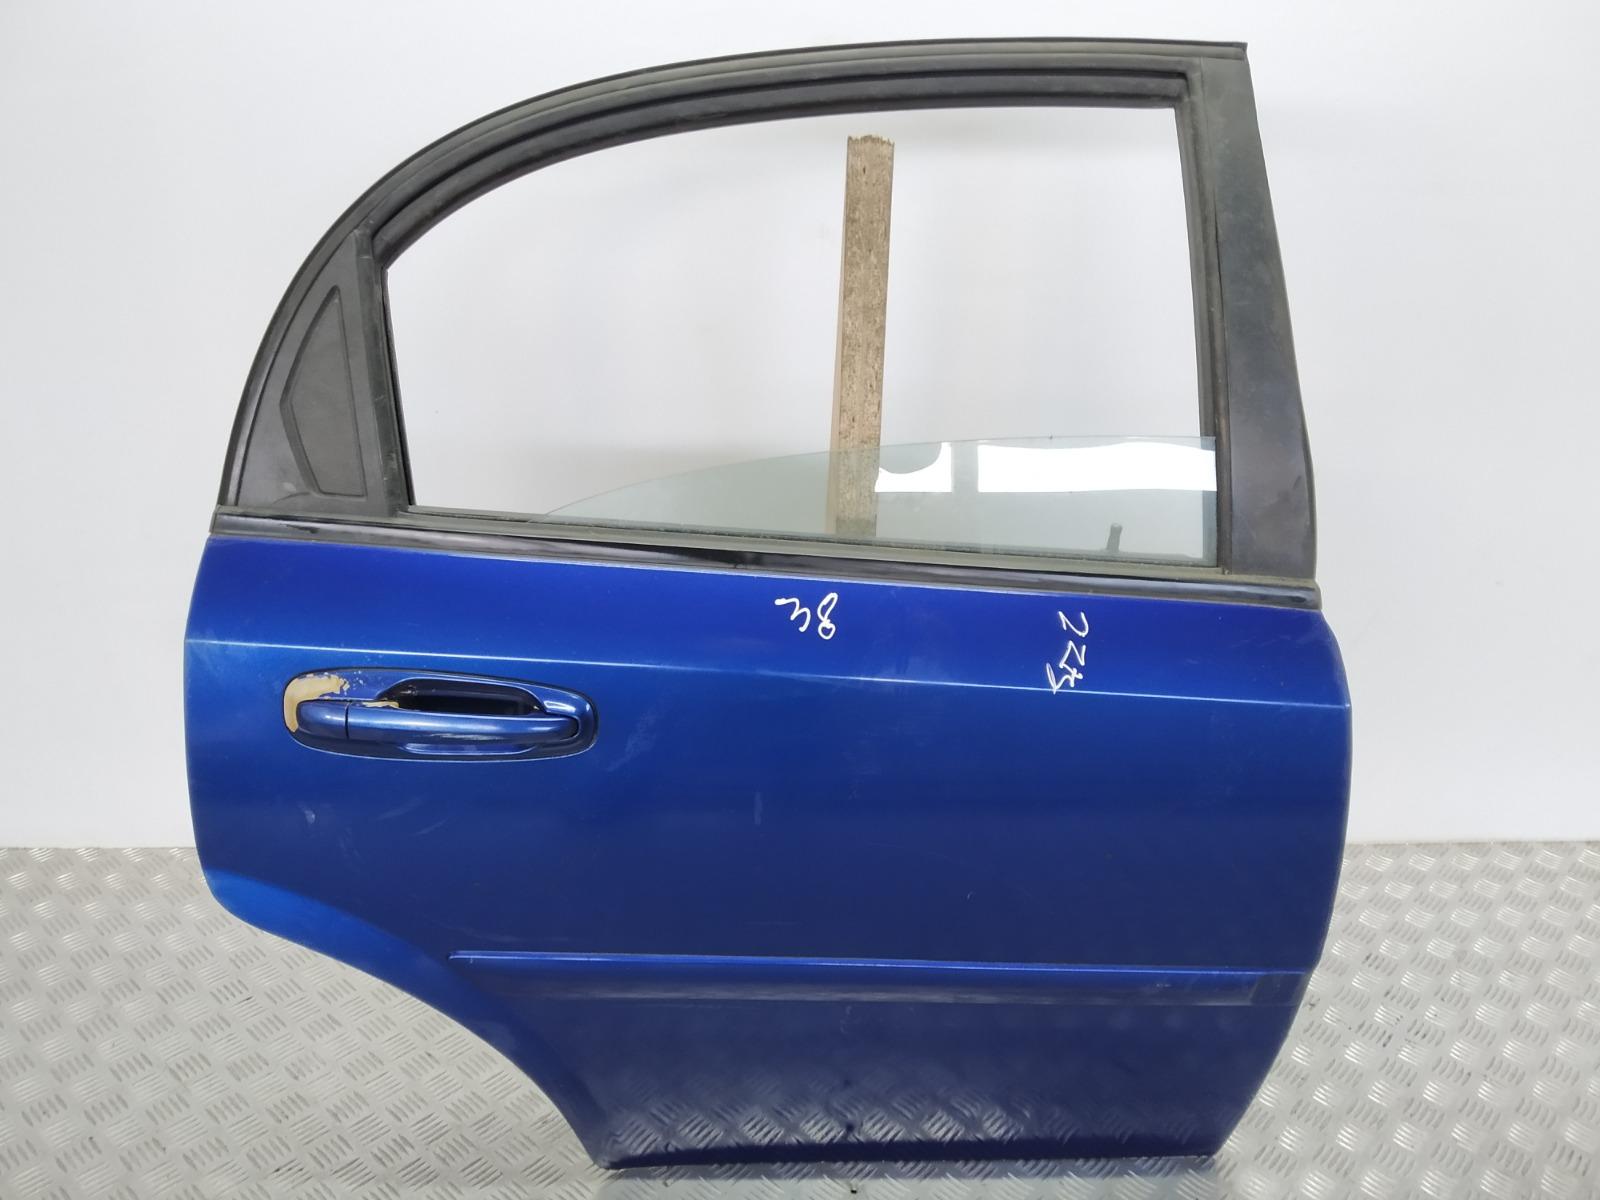 Дверь задняя правая Chevrolet Lacetti 1.6 I 2006 (б/у)